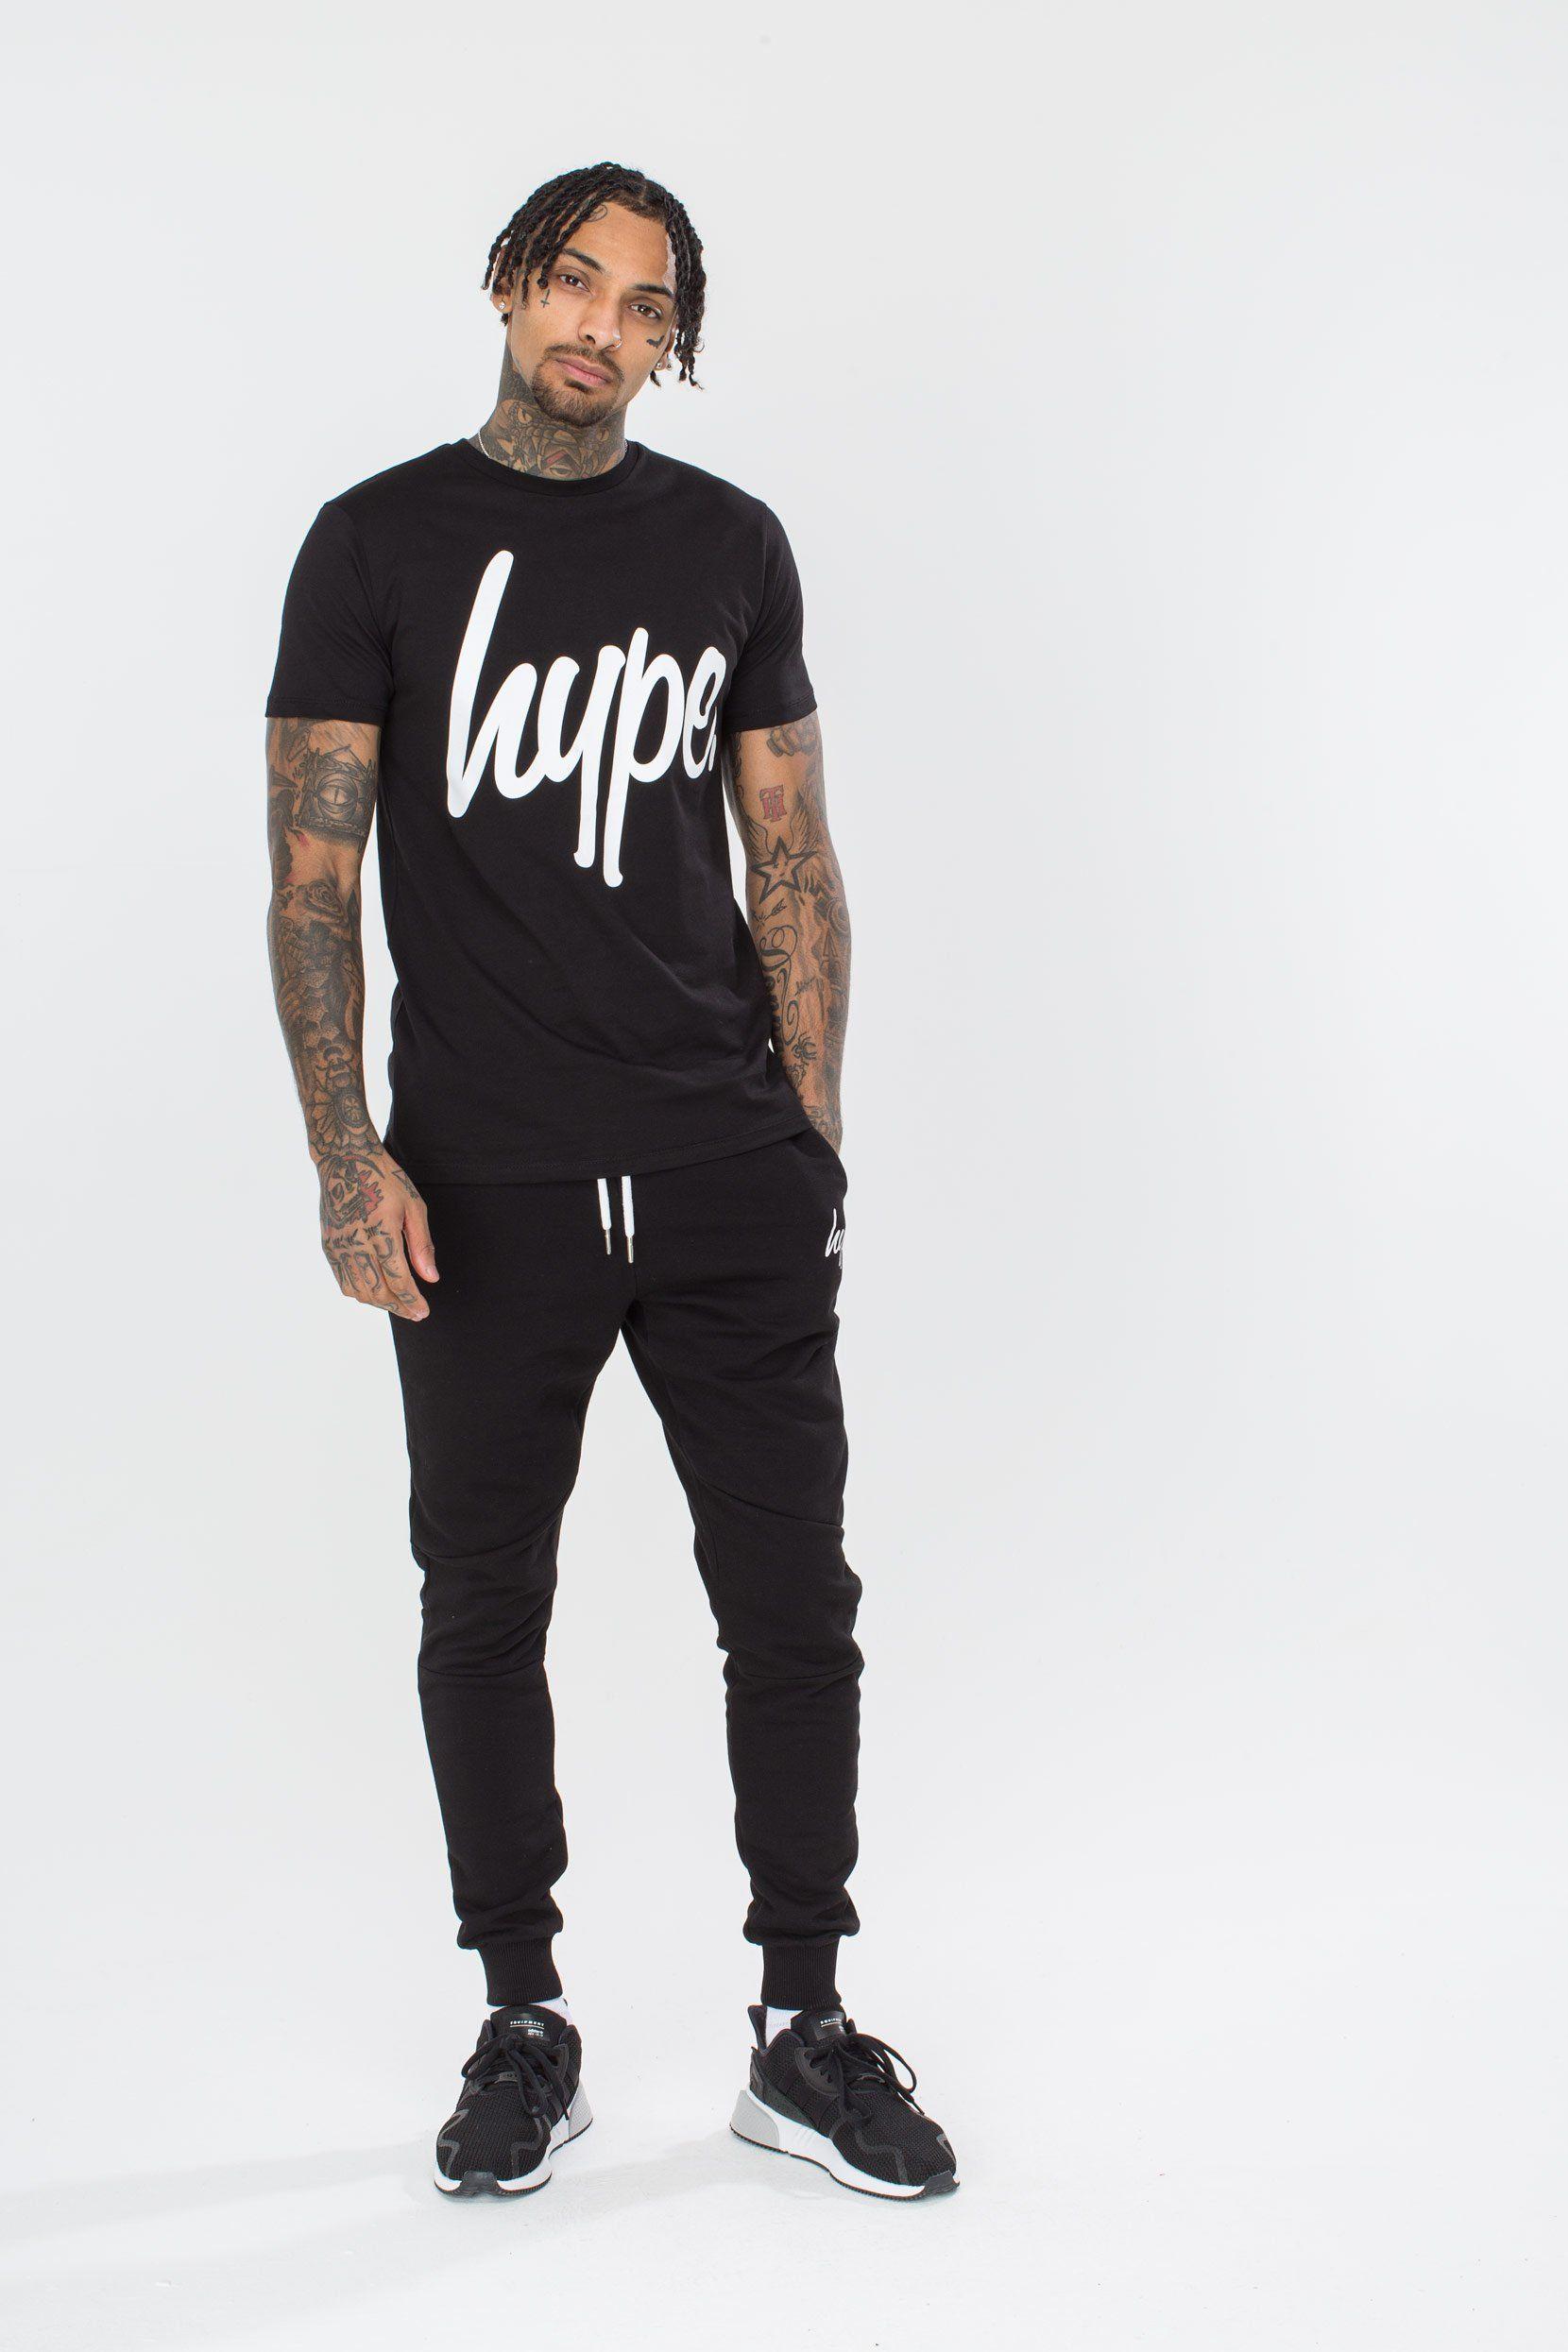 Hype Black Script Mens T-Shirt M